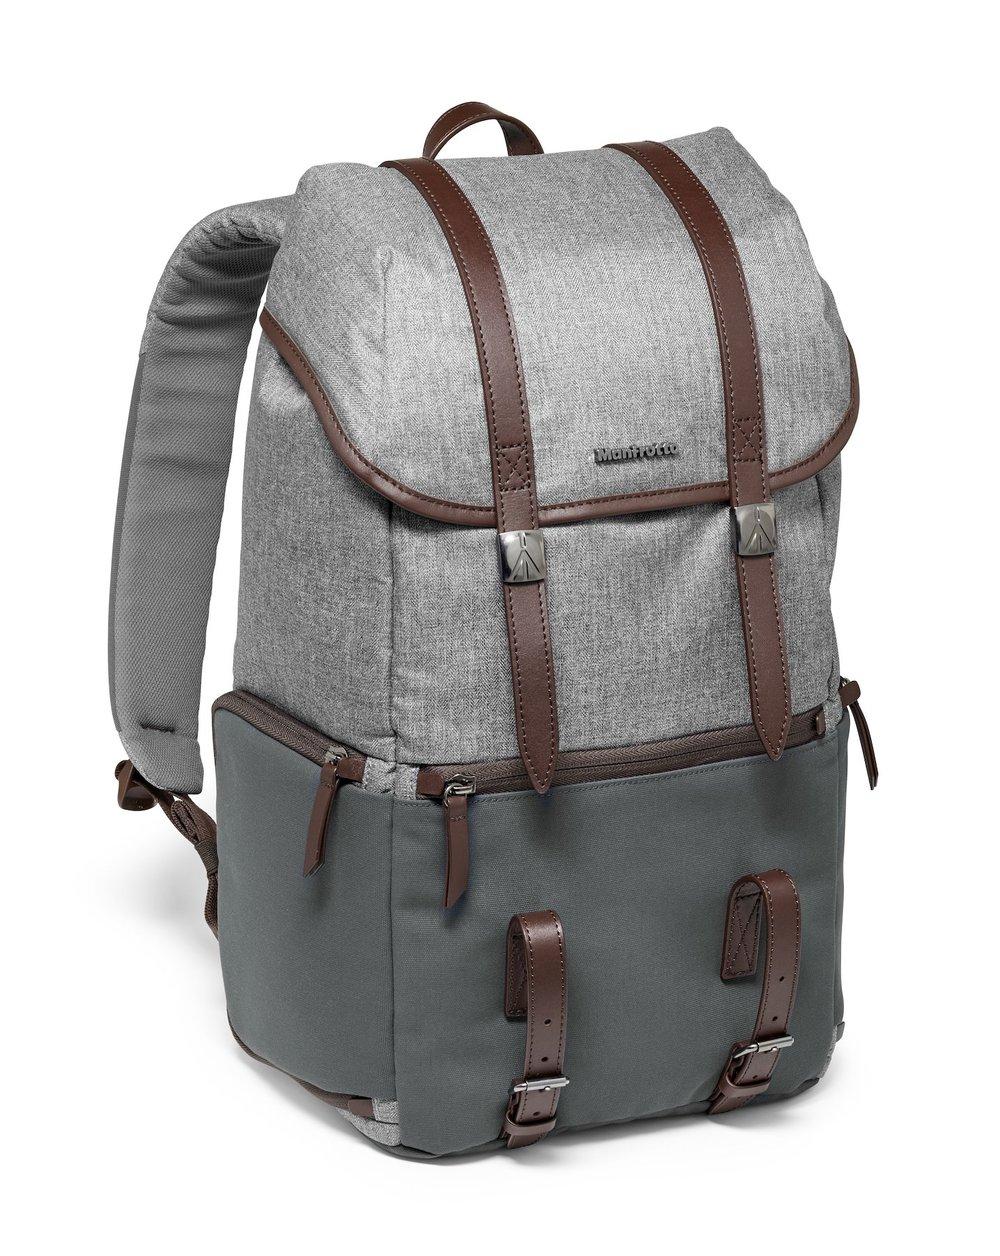 Backpack Camera Bag.jpg